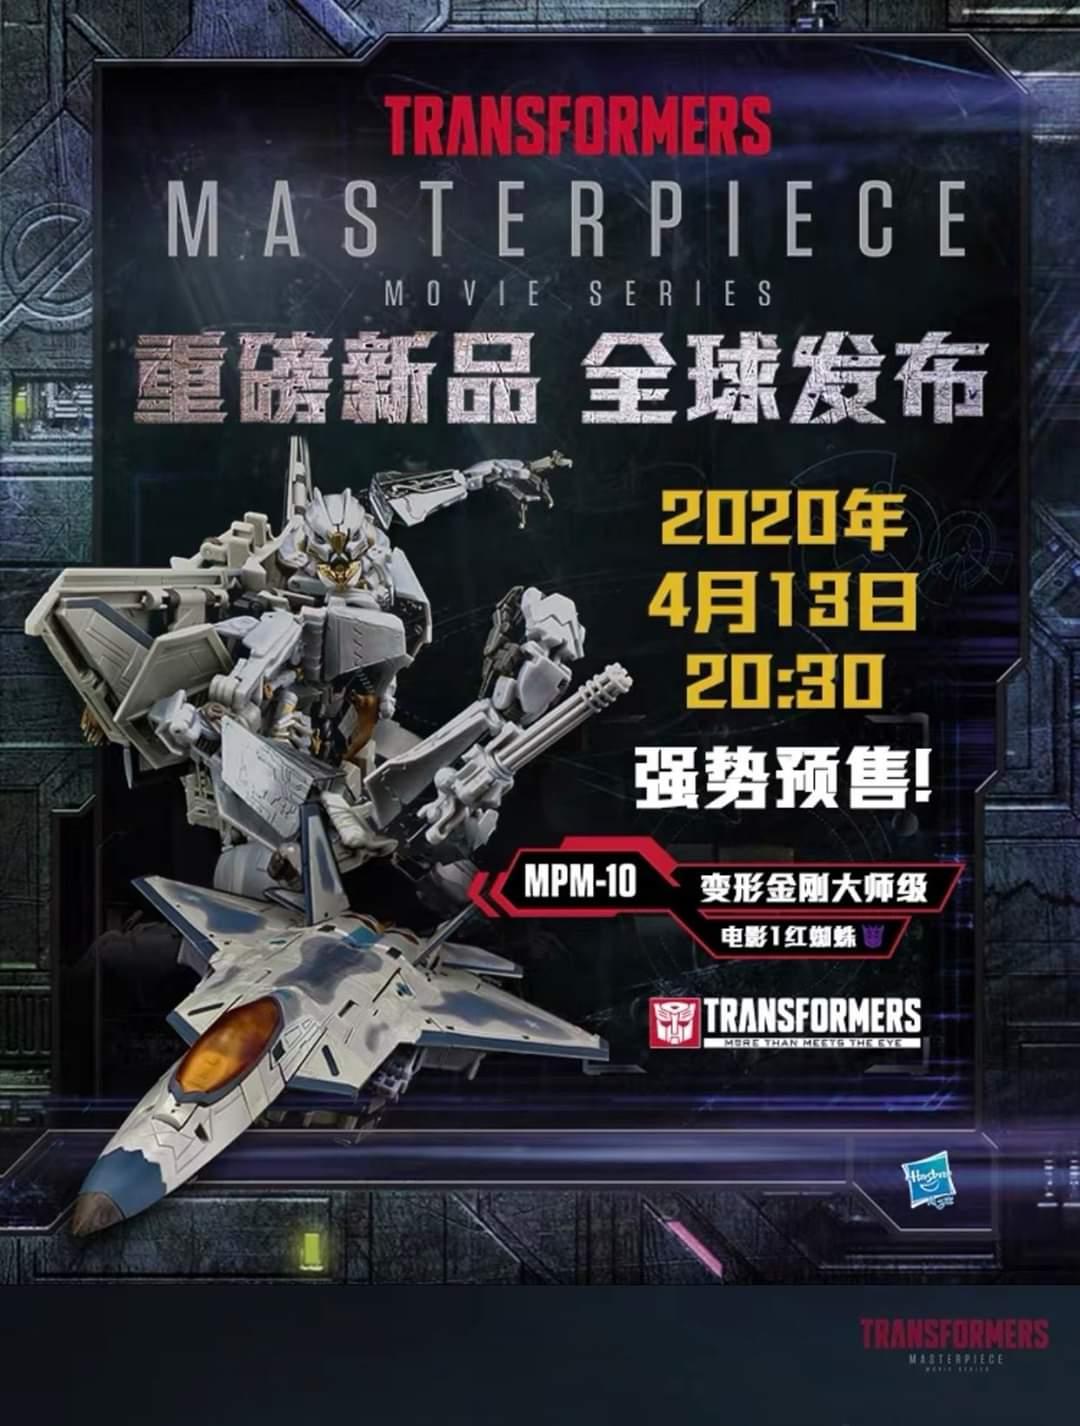 [Masterpiece Film] MPM-10 Starscream QnVhz6Sd_o